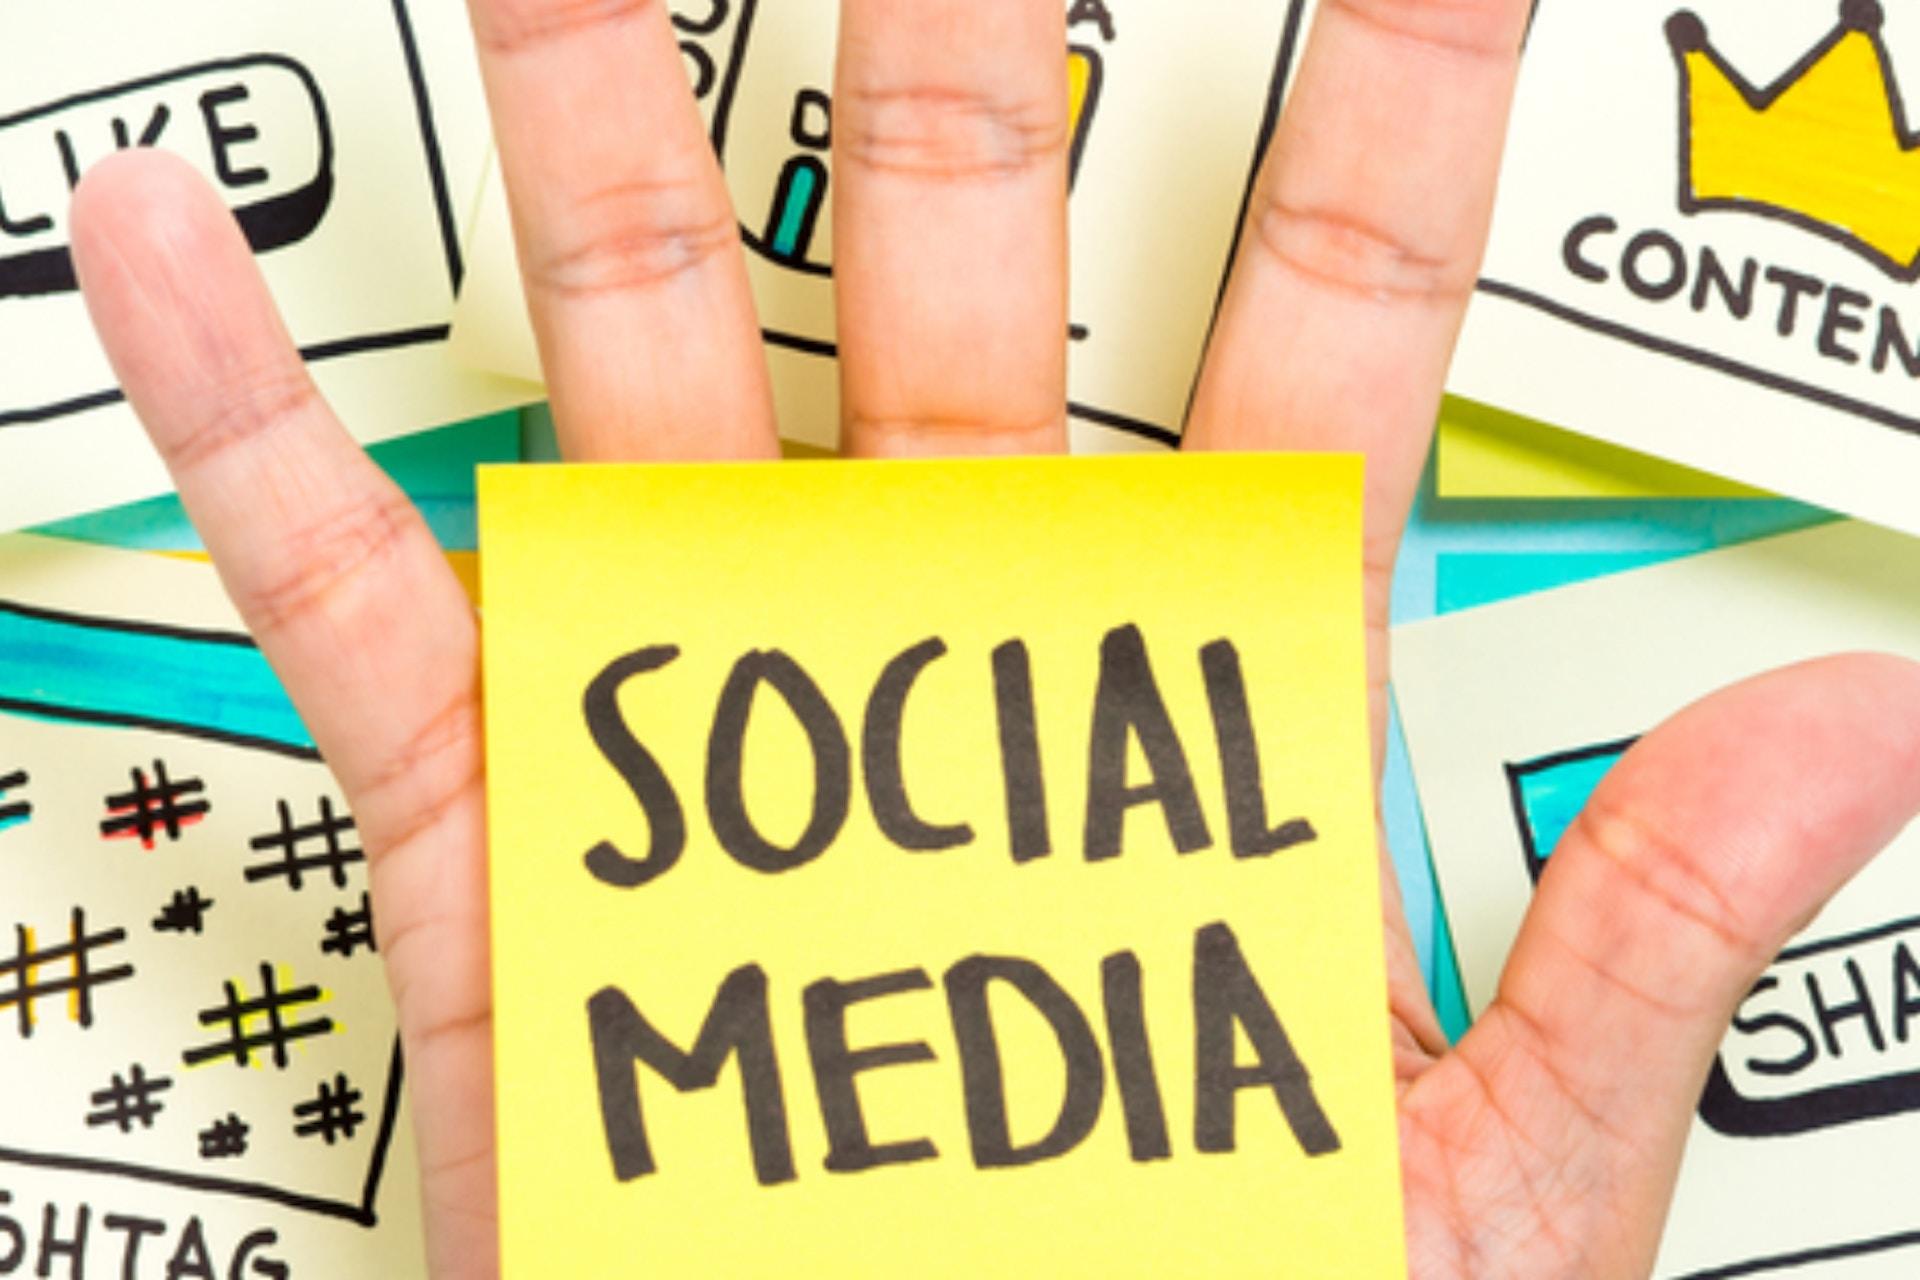 facebook vs twitter differences on social media